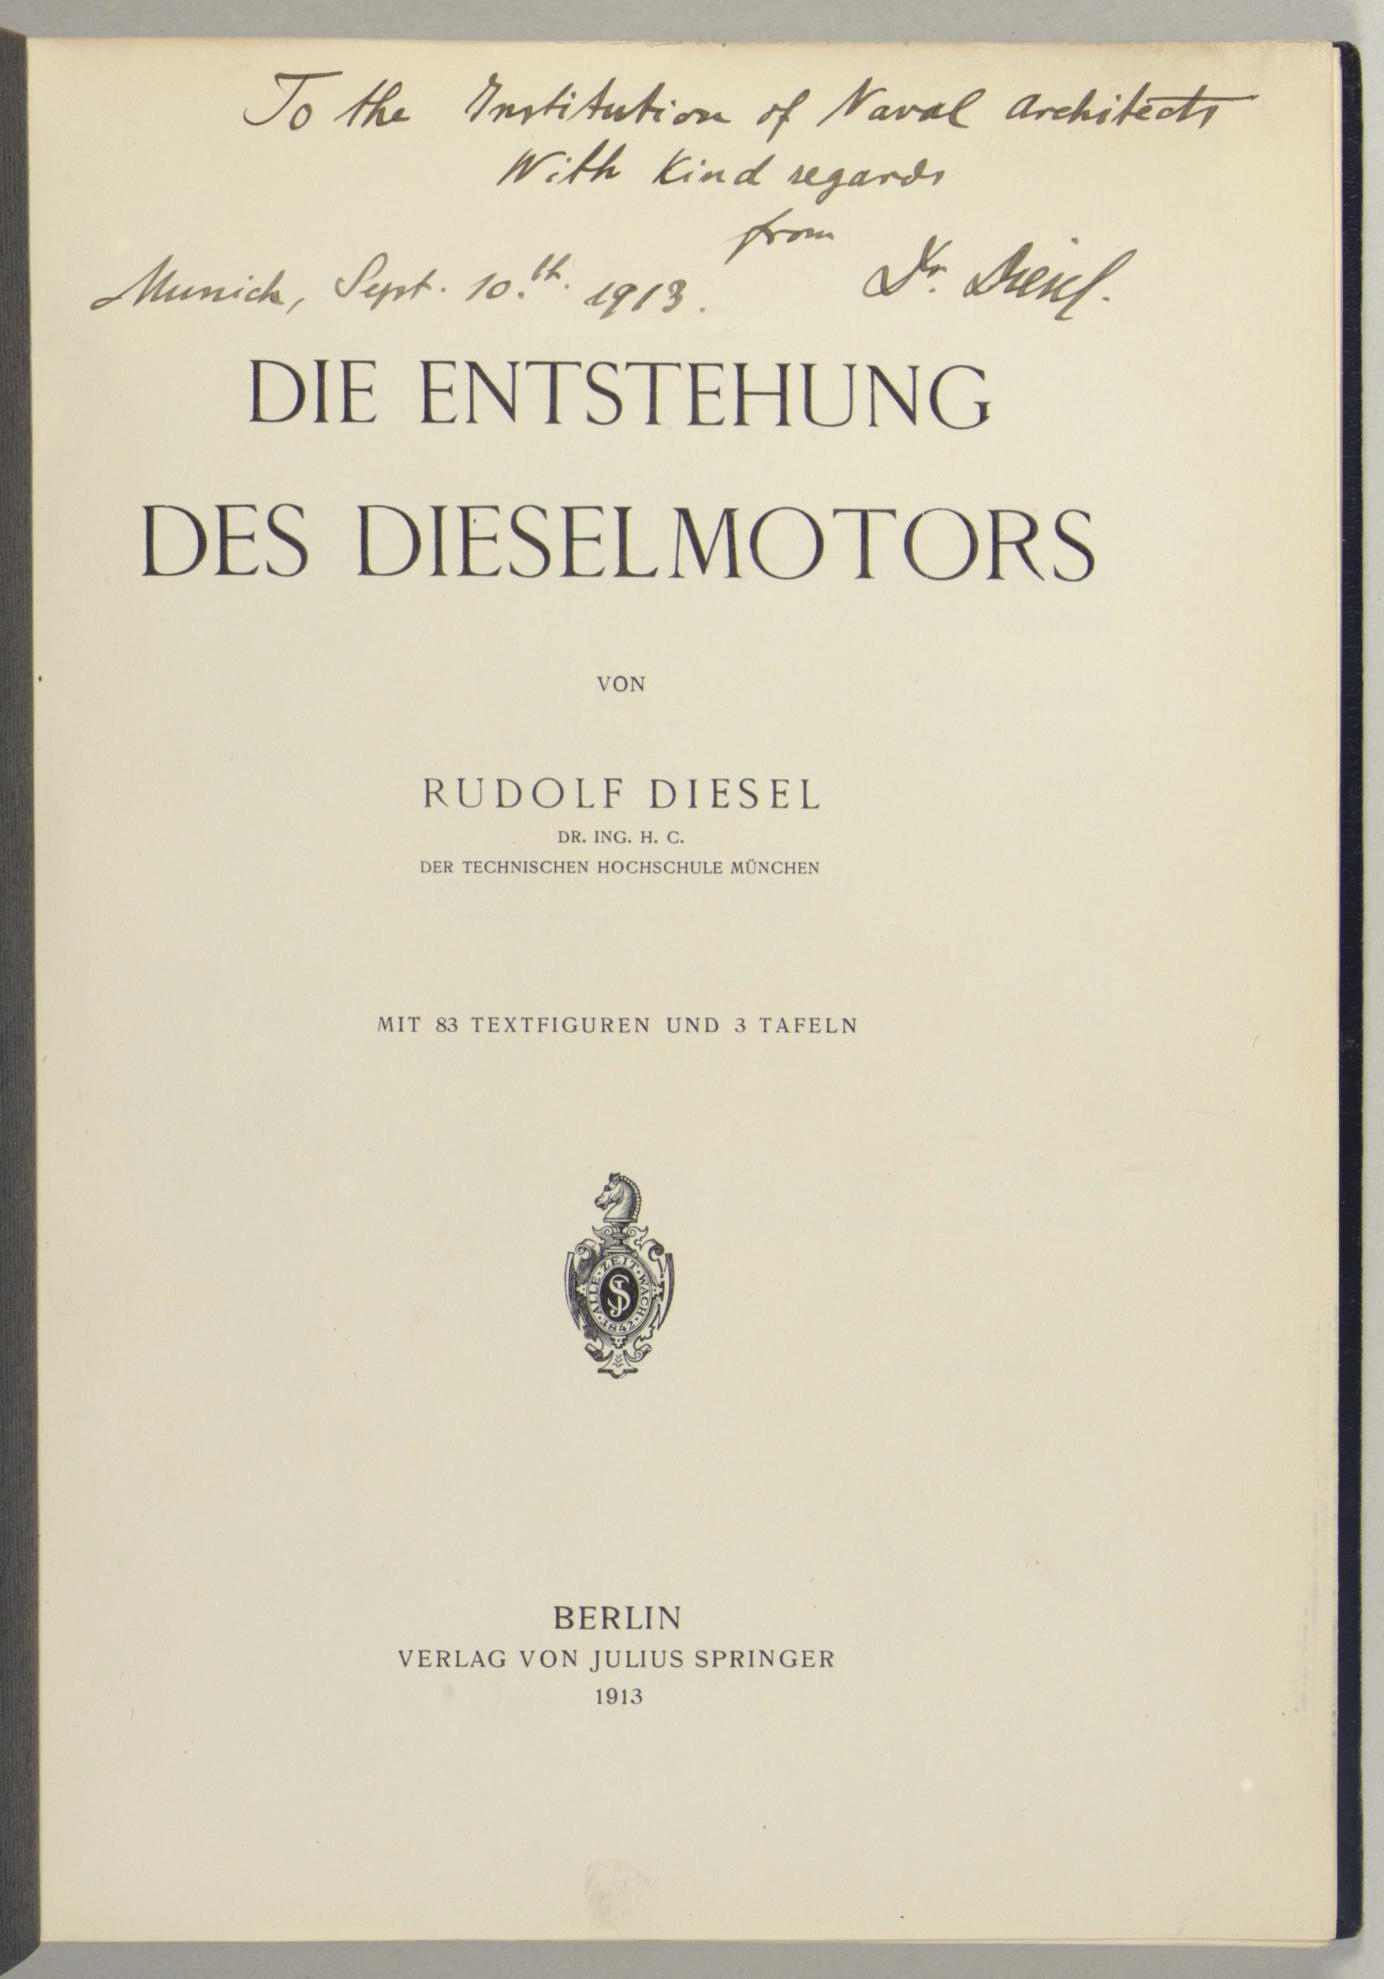 DIESEL, Rudolf (1858-1913). Di